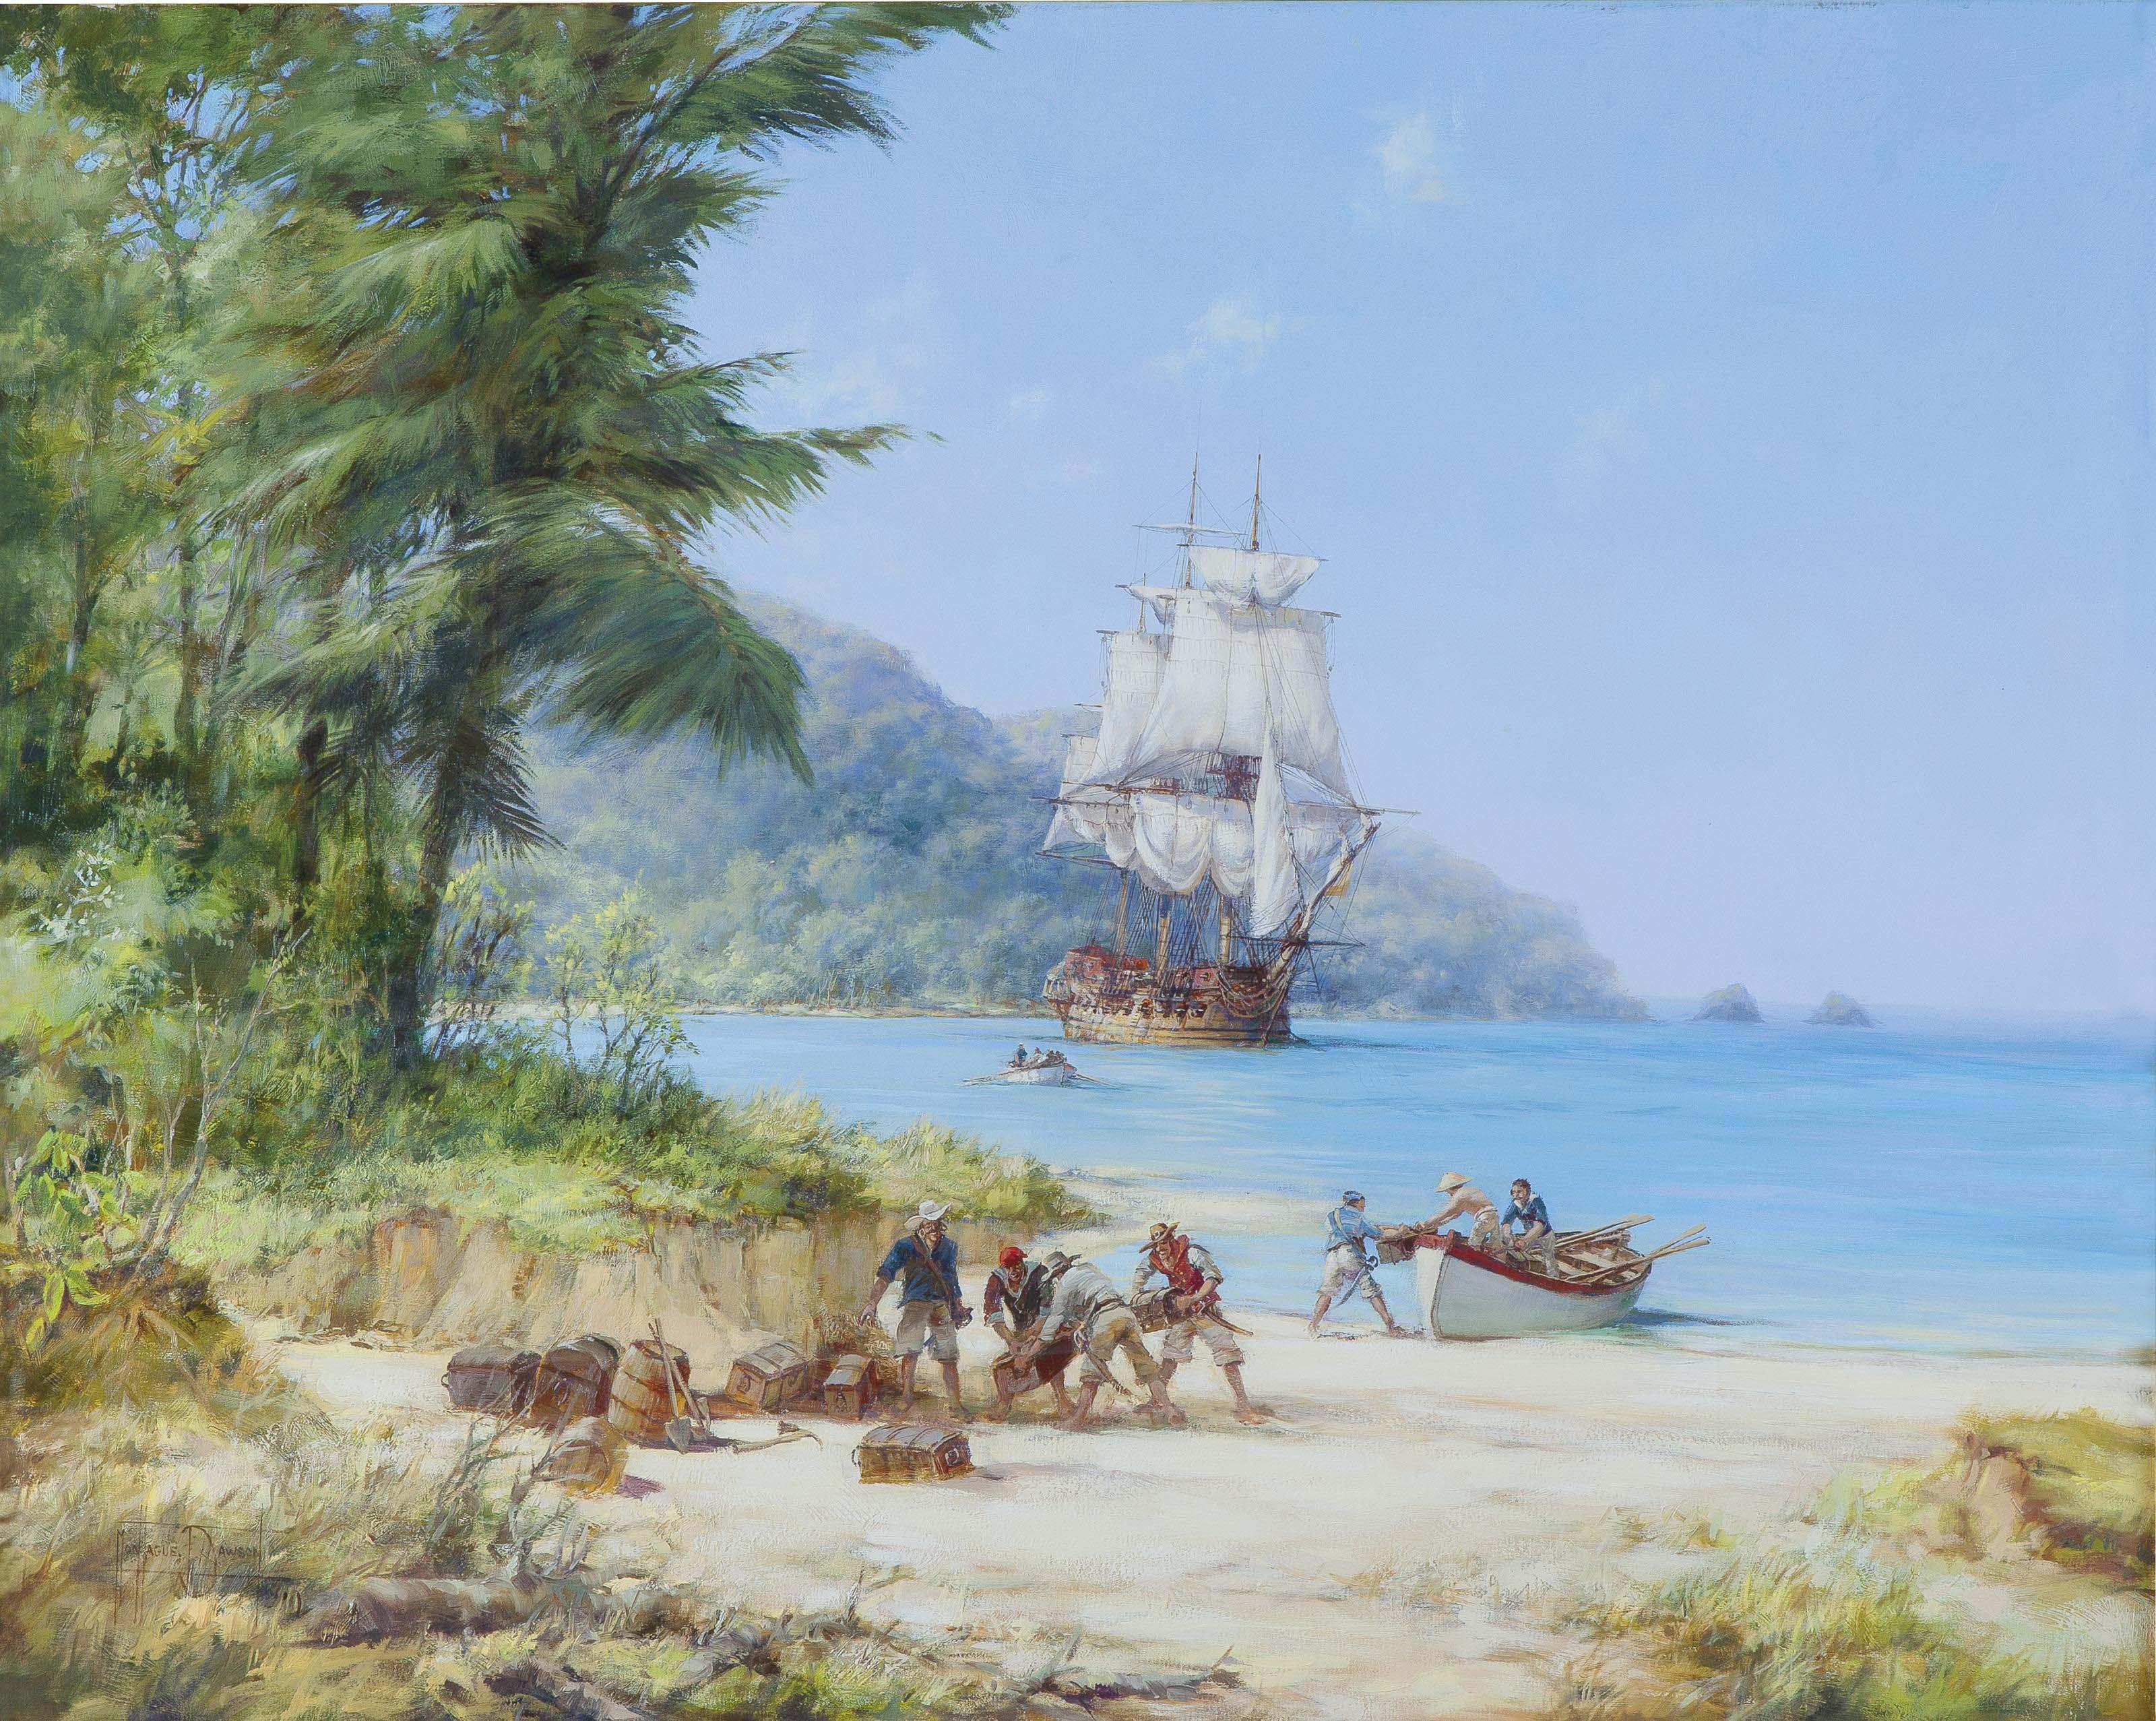 Henry Morgan's Ship off Gorgona in the Pacific